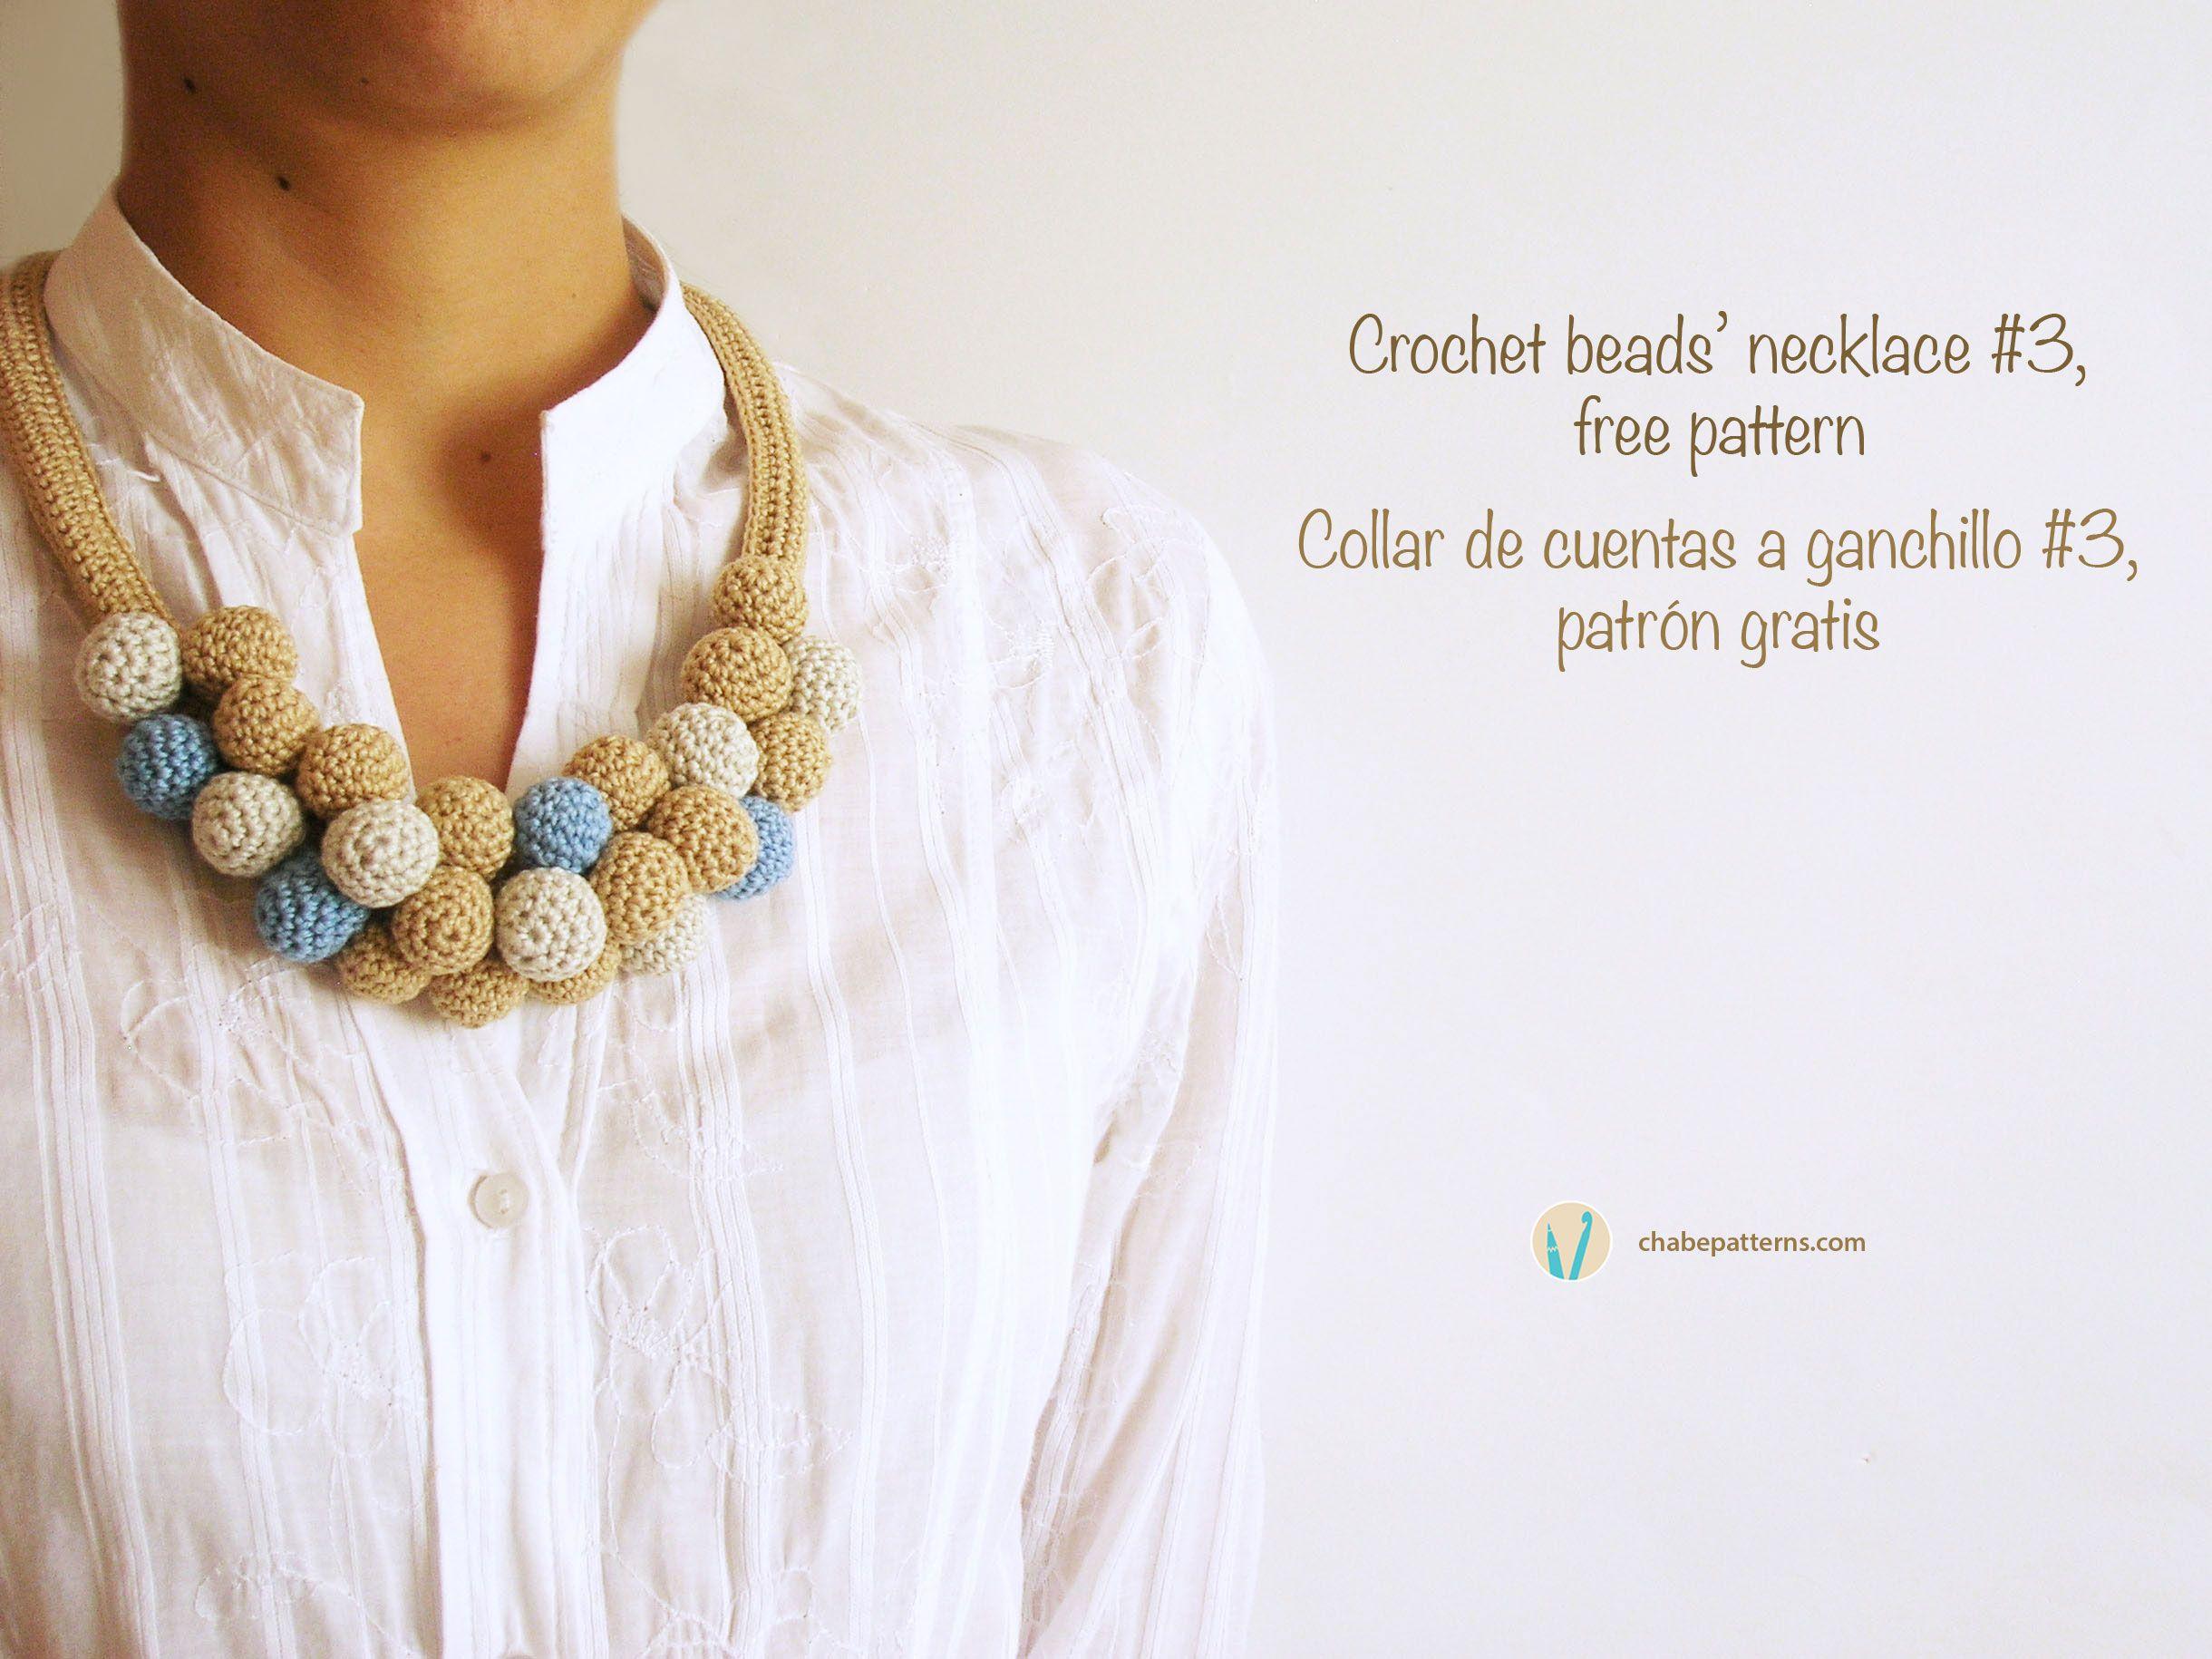 Moderno Patrón Libre Del Collar Crochet Festooning - Manta de Tejer ...